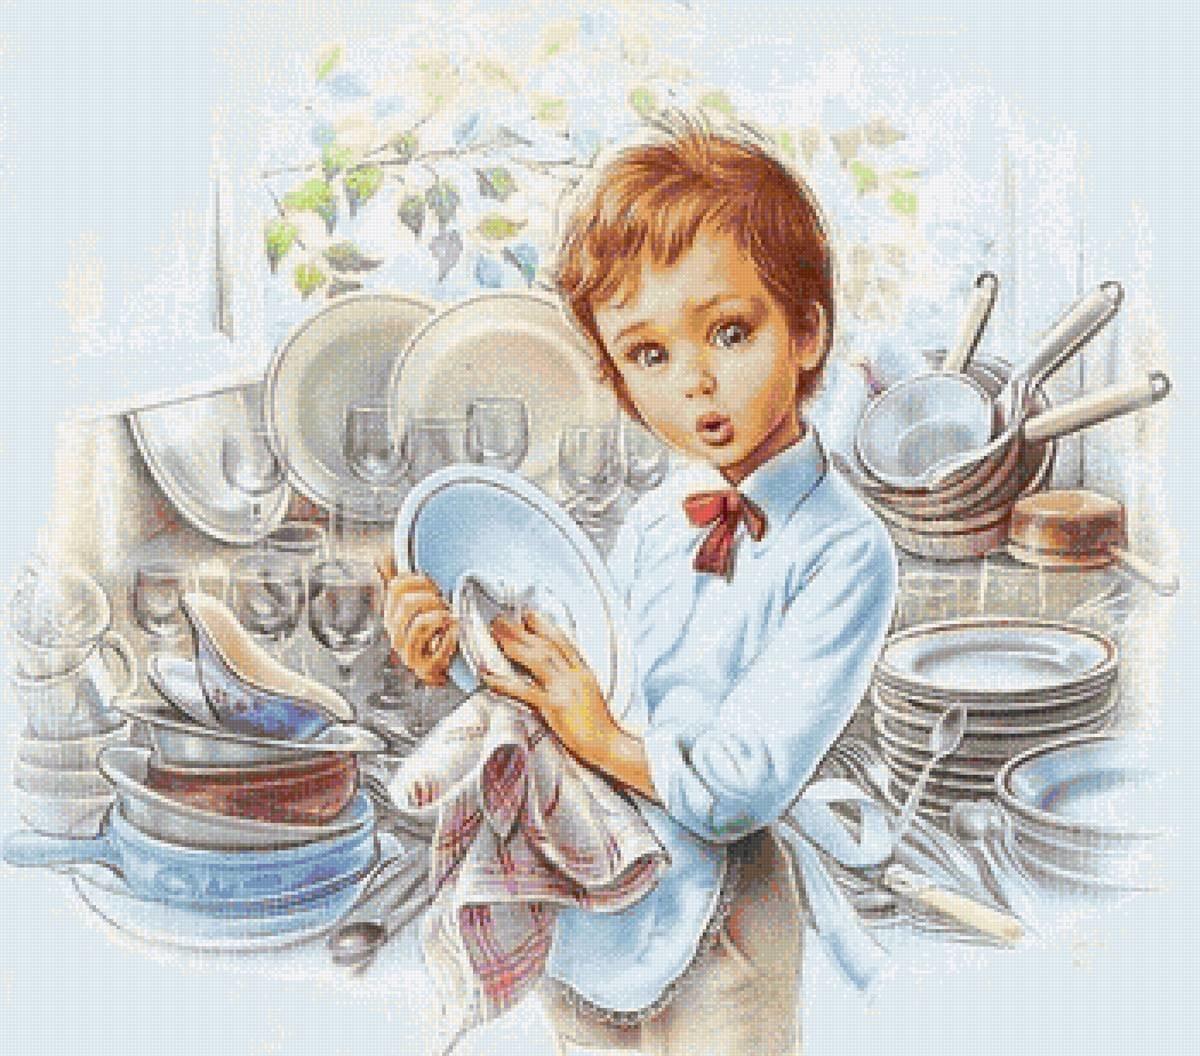 Картинки для детей посуду мою